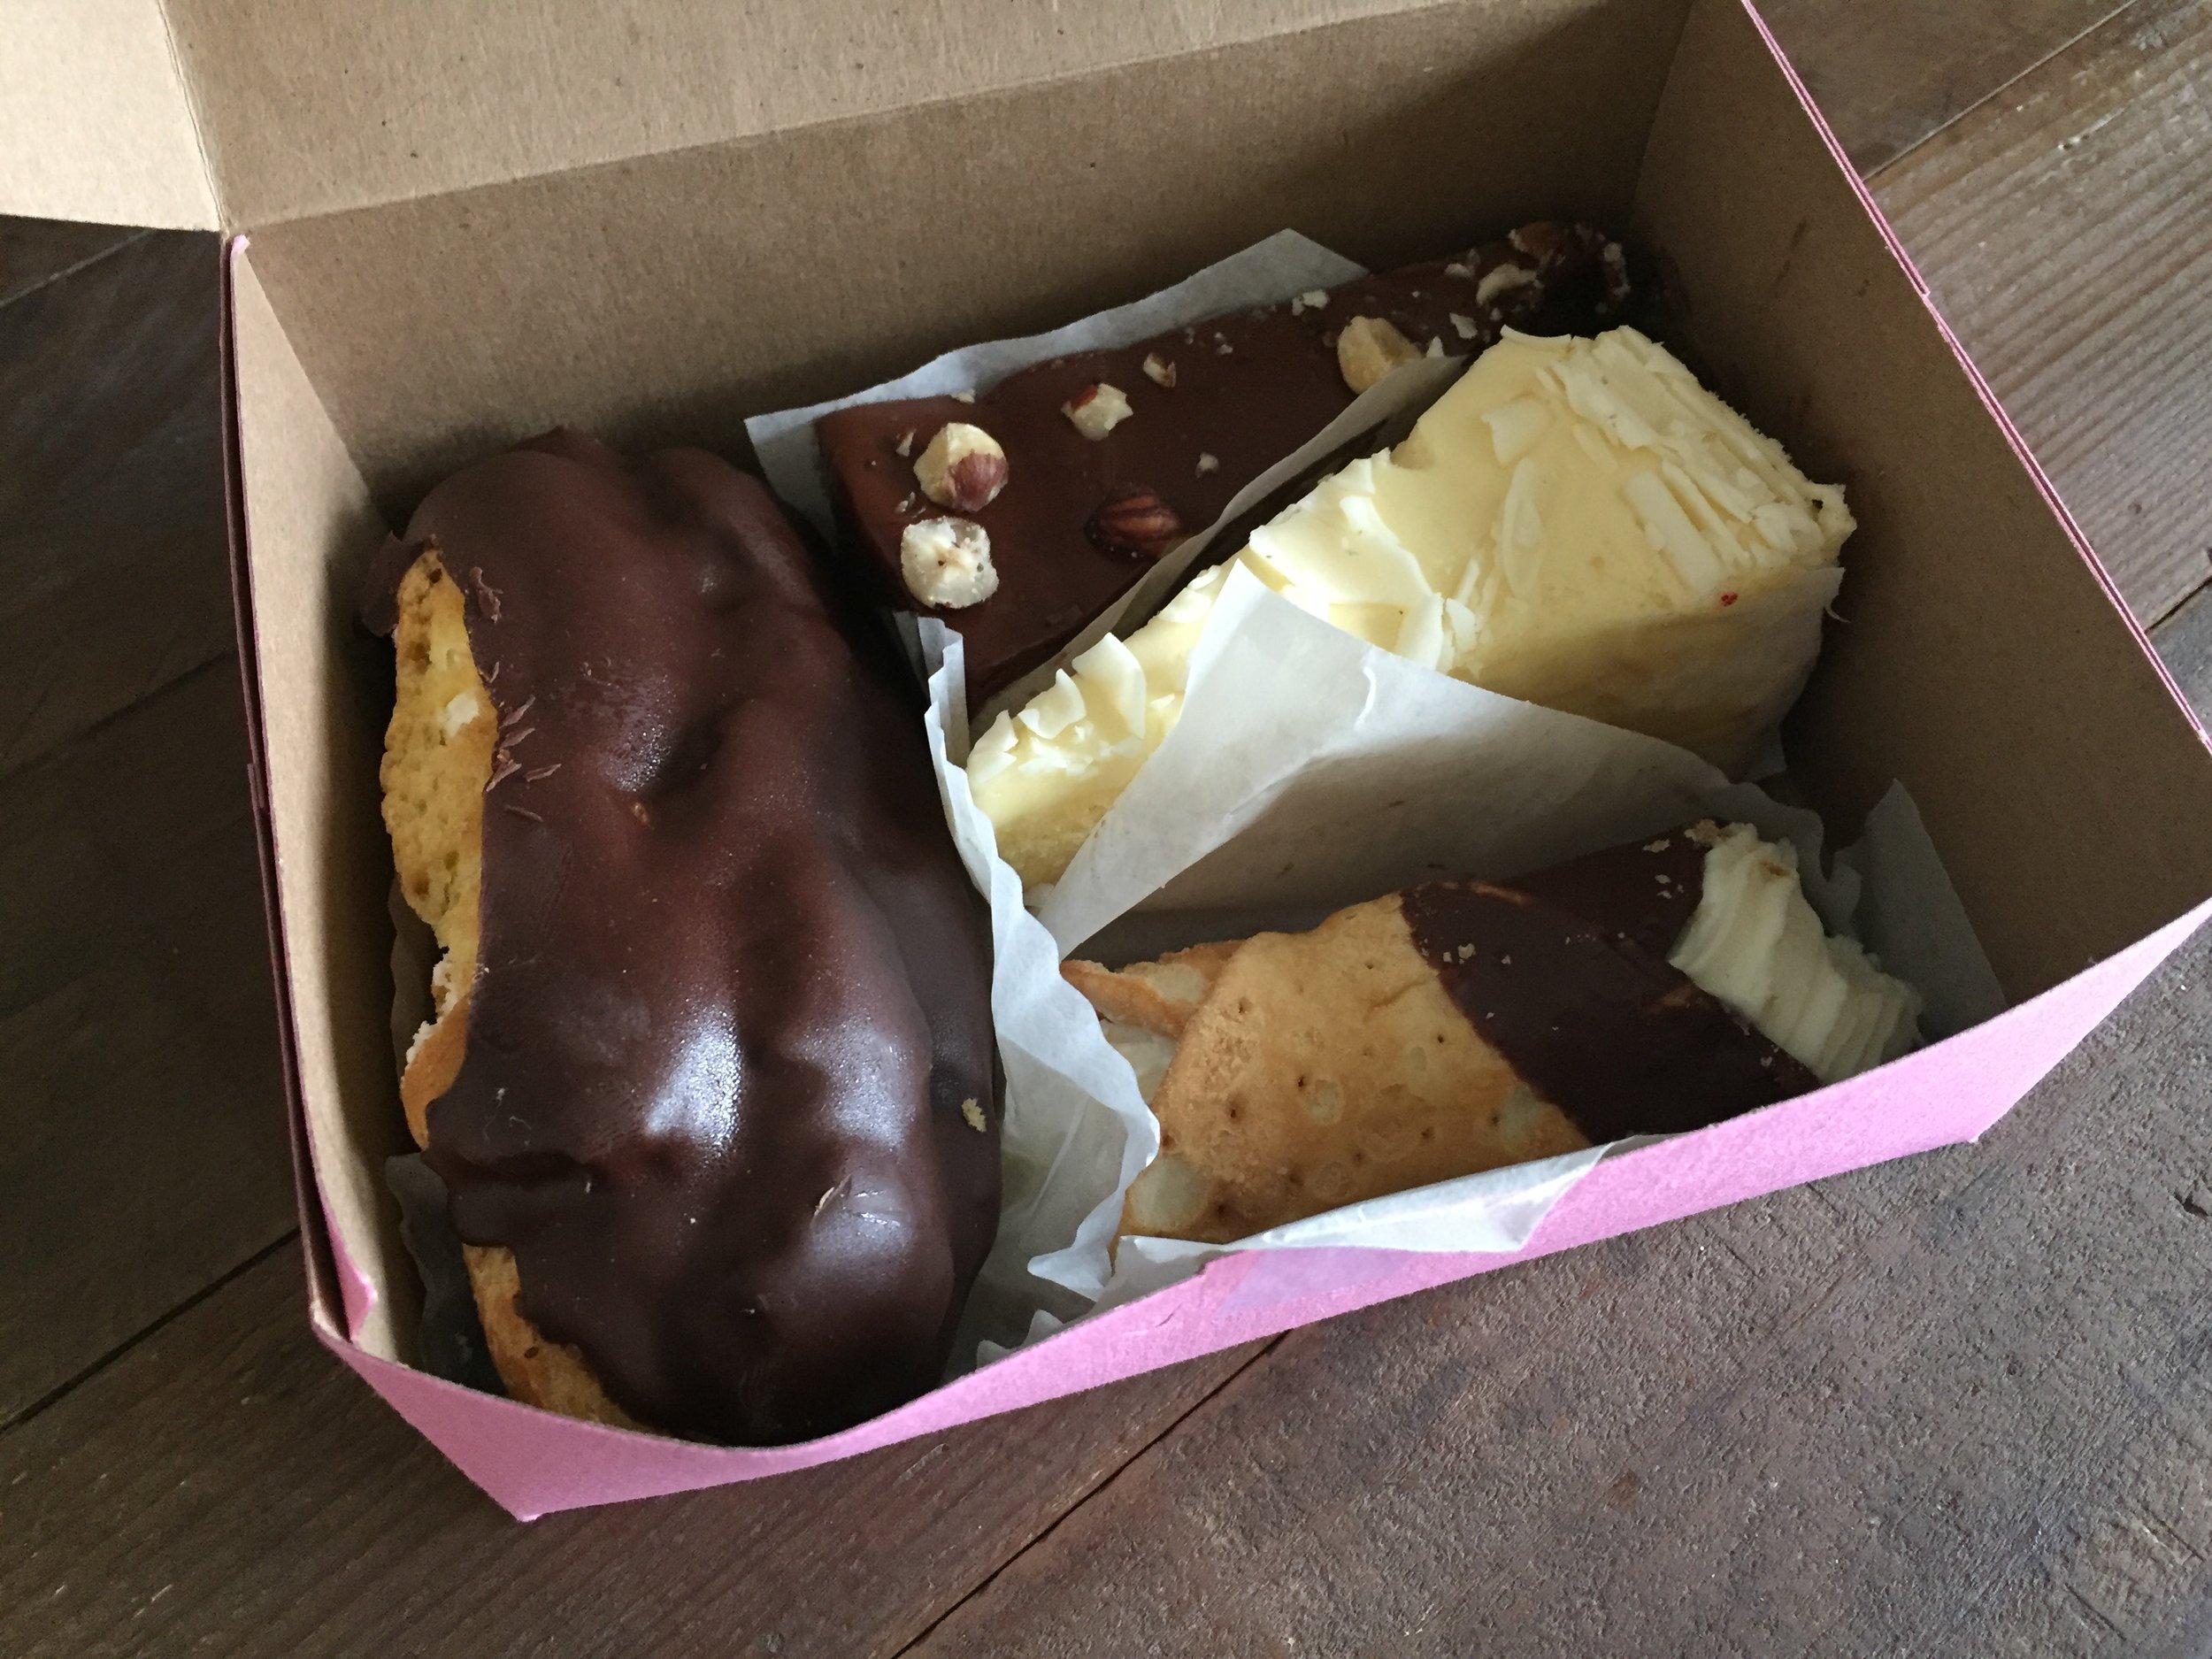 Box break down: Éclair, dulce de leche cake, limoncello and a cannoli.